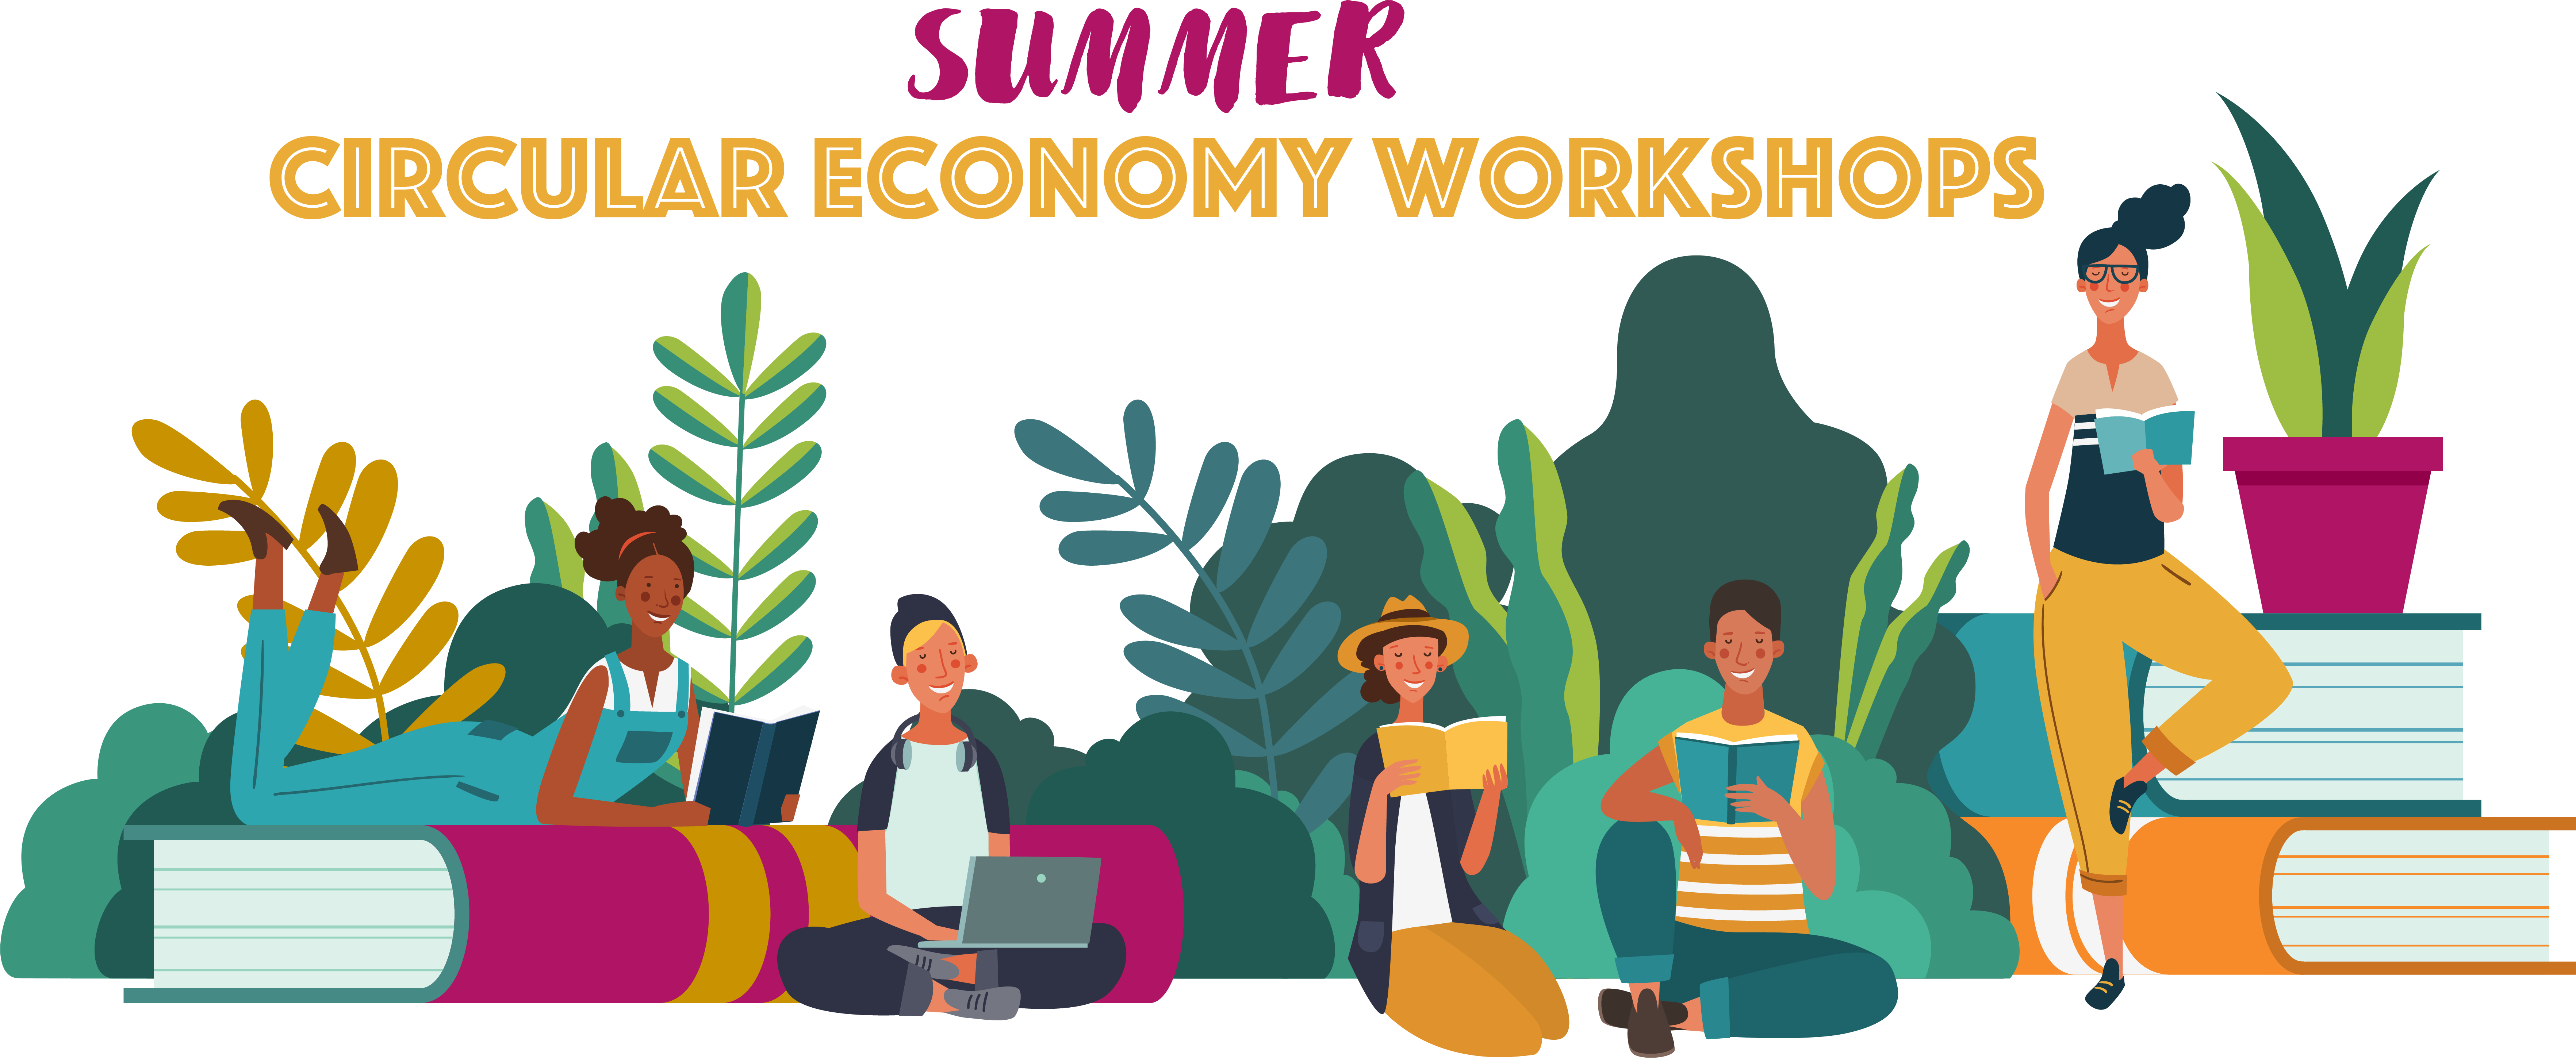 Circular Economy Workshops